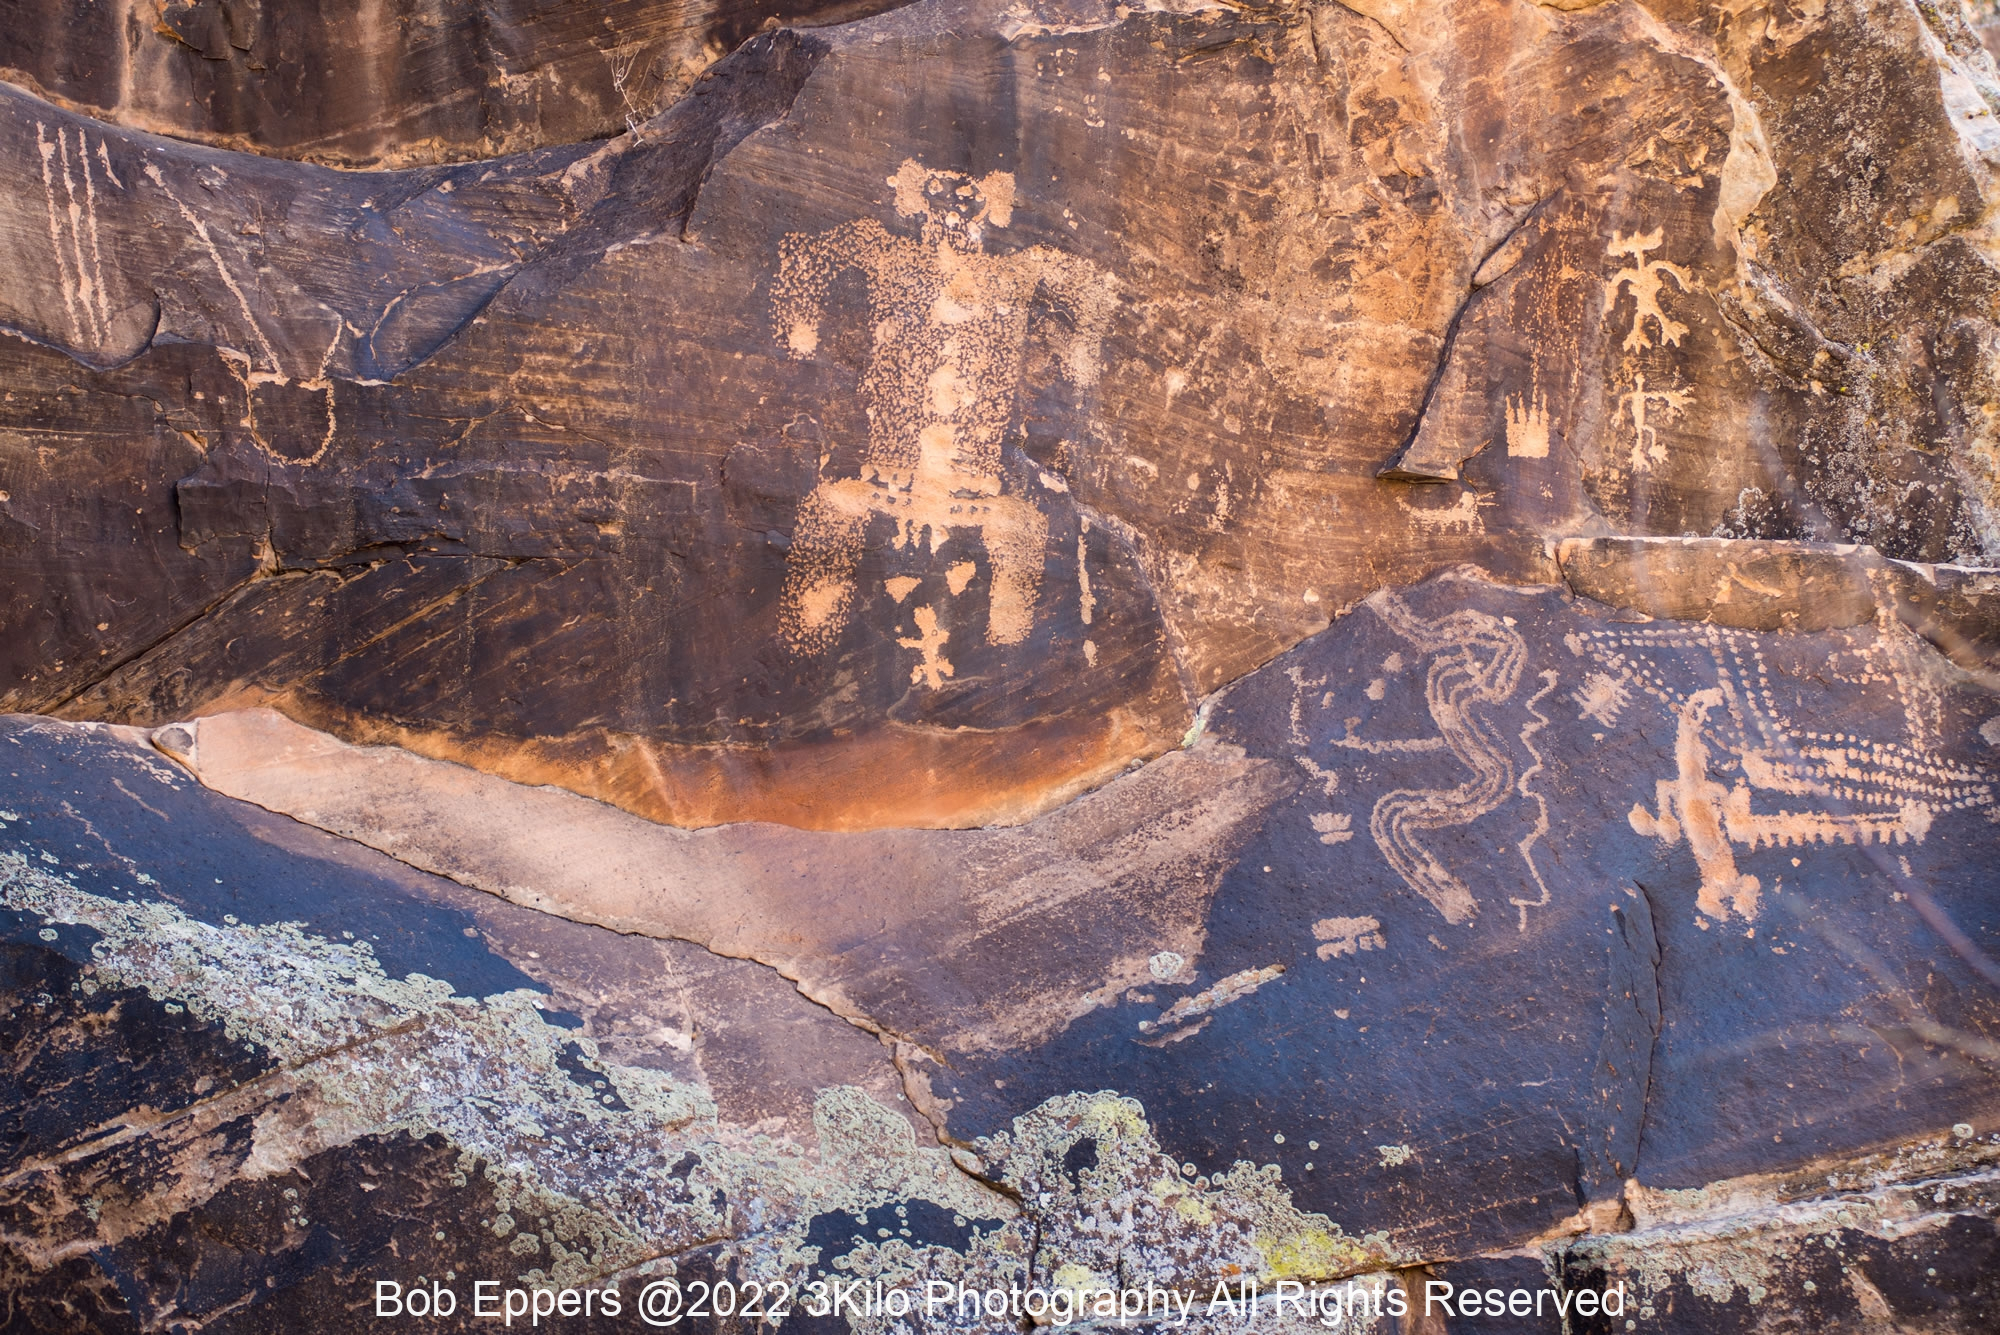 Photo of the Birthing Petroglyph in Chevelon Creek, AZ